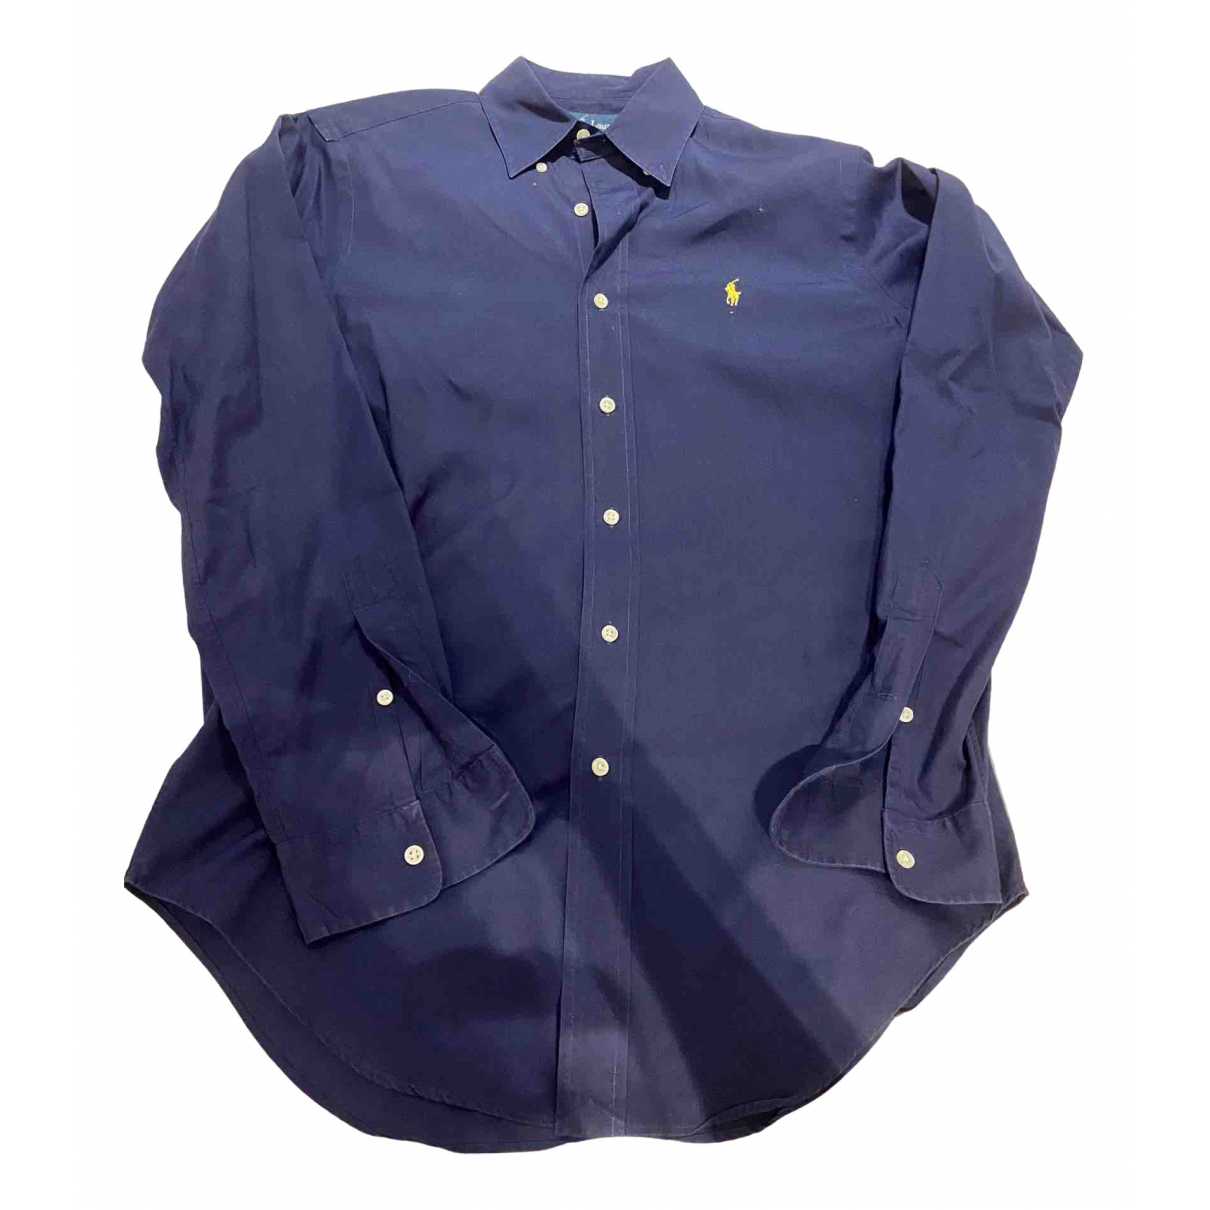 Ralph Lauren \N Navy Cotton Shirts for Men S International